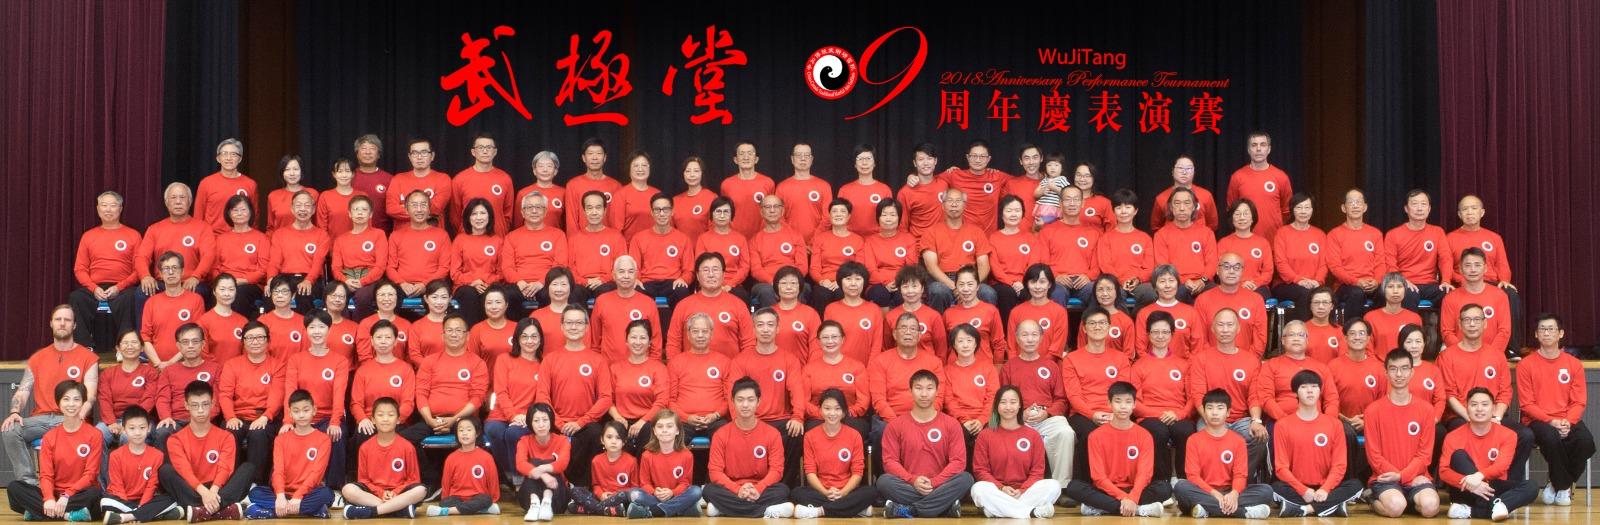 Wujitang 9th Anniversary